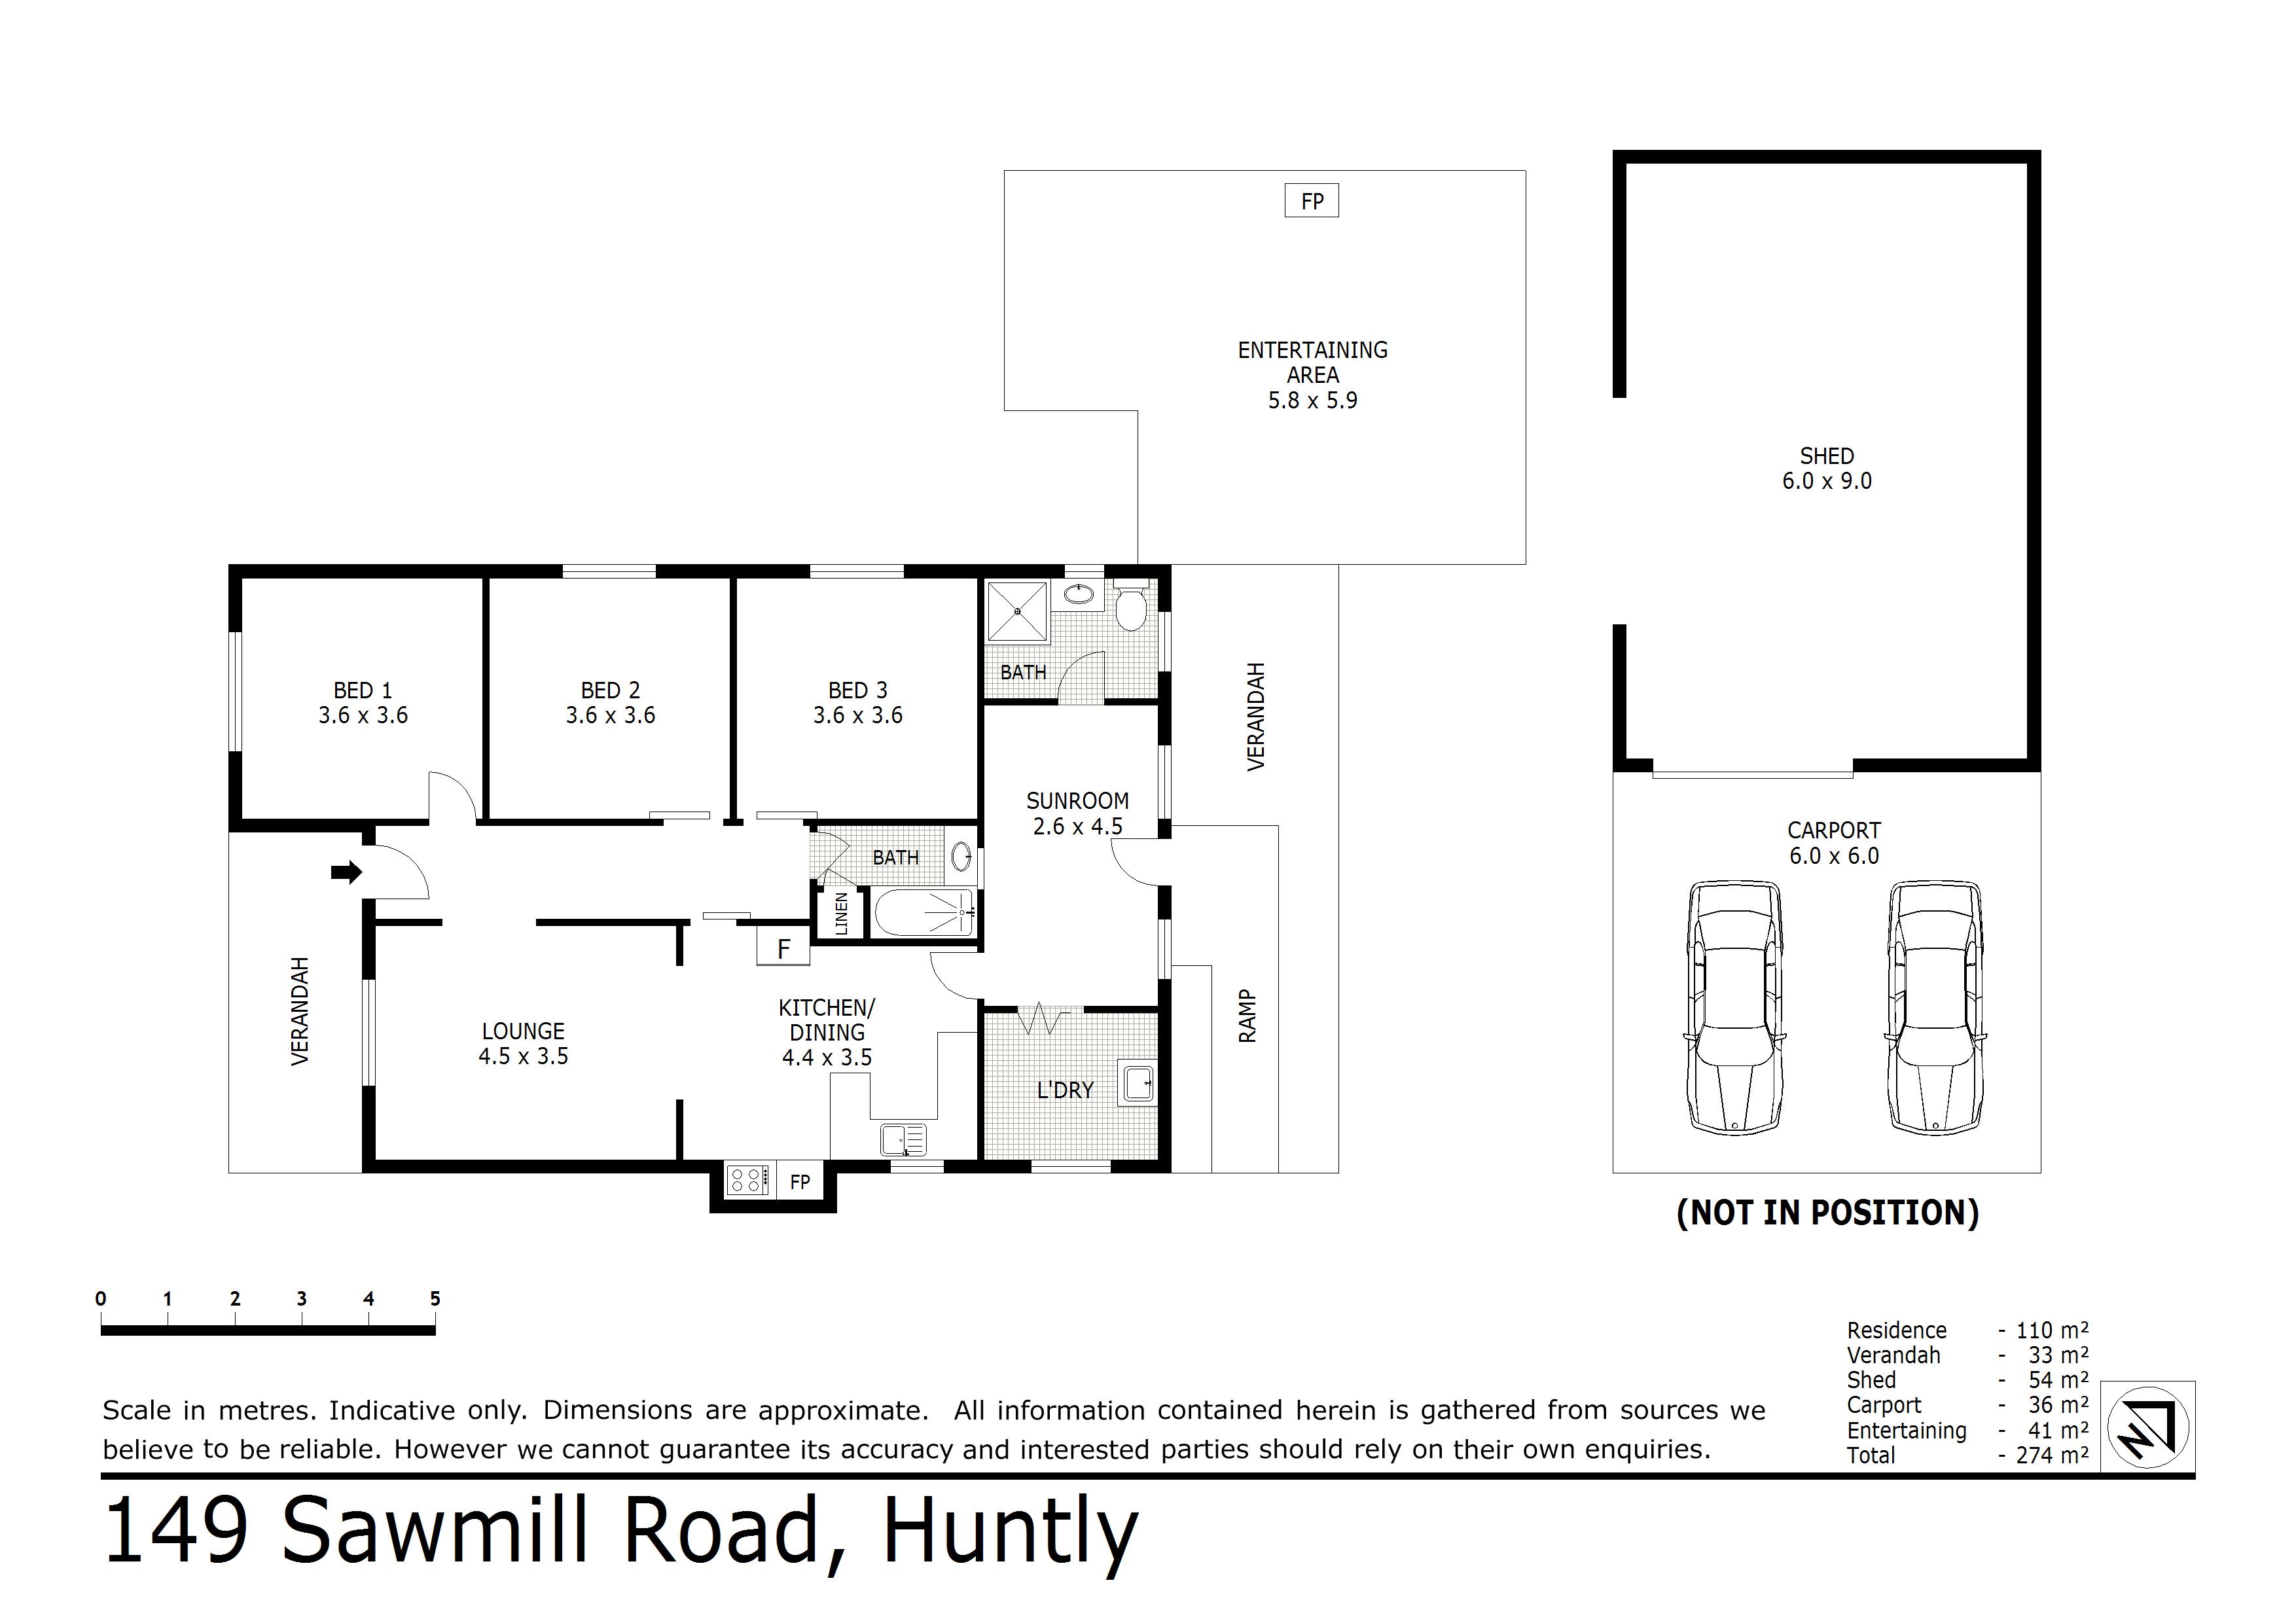 149 Sawmill Road, Huntly, VIC 3551